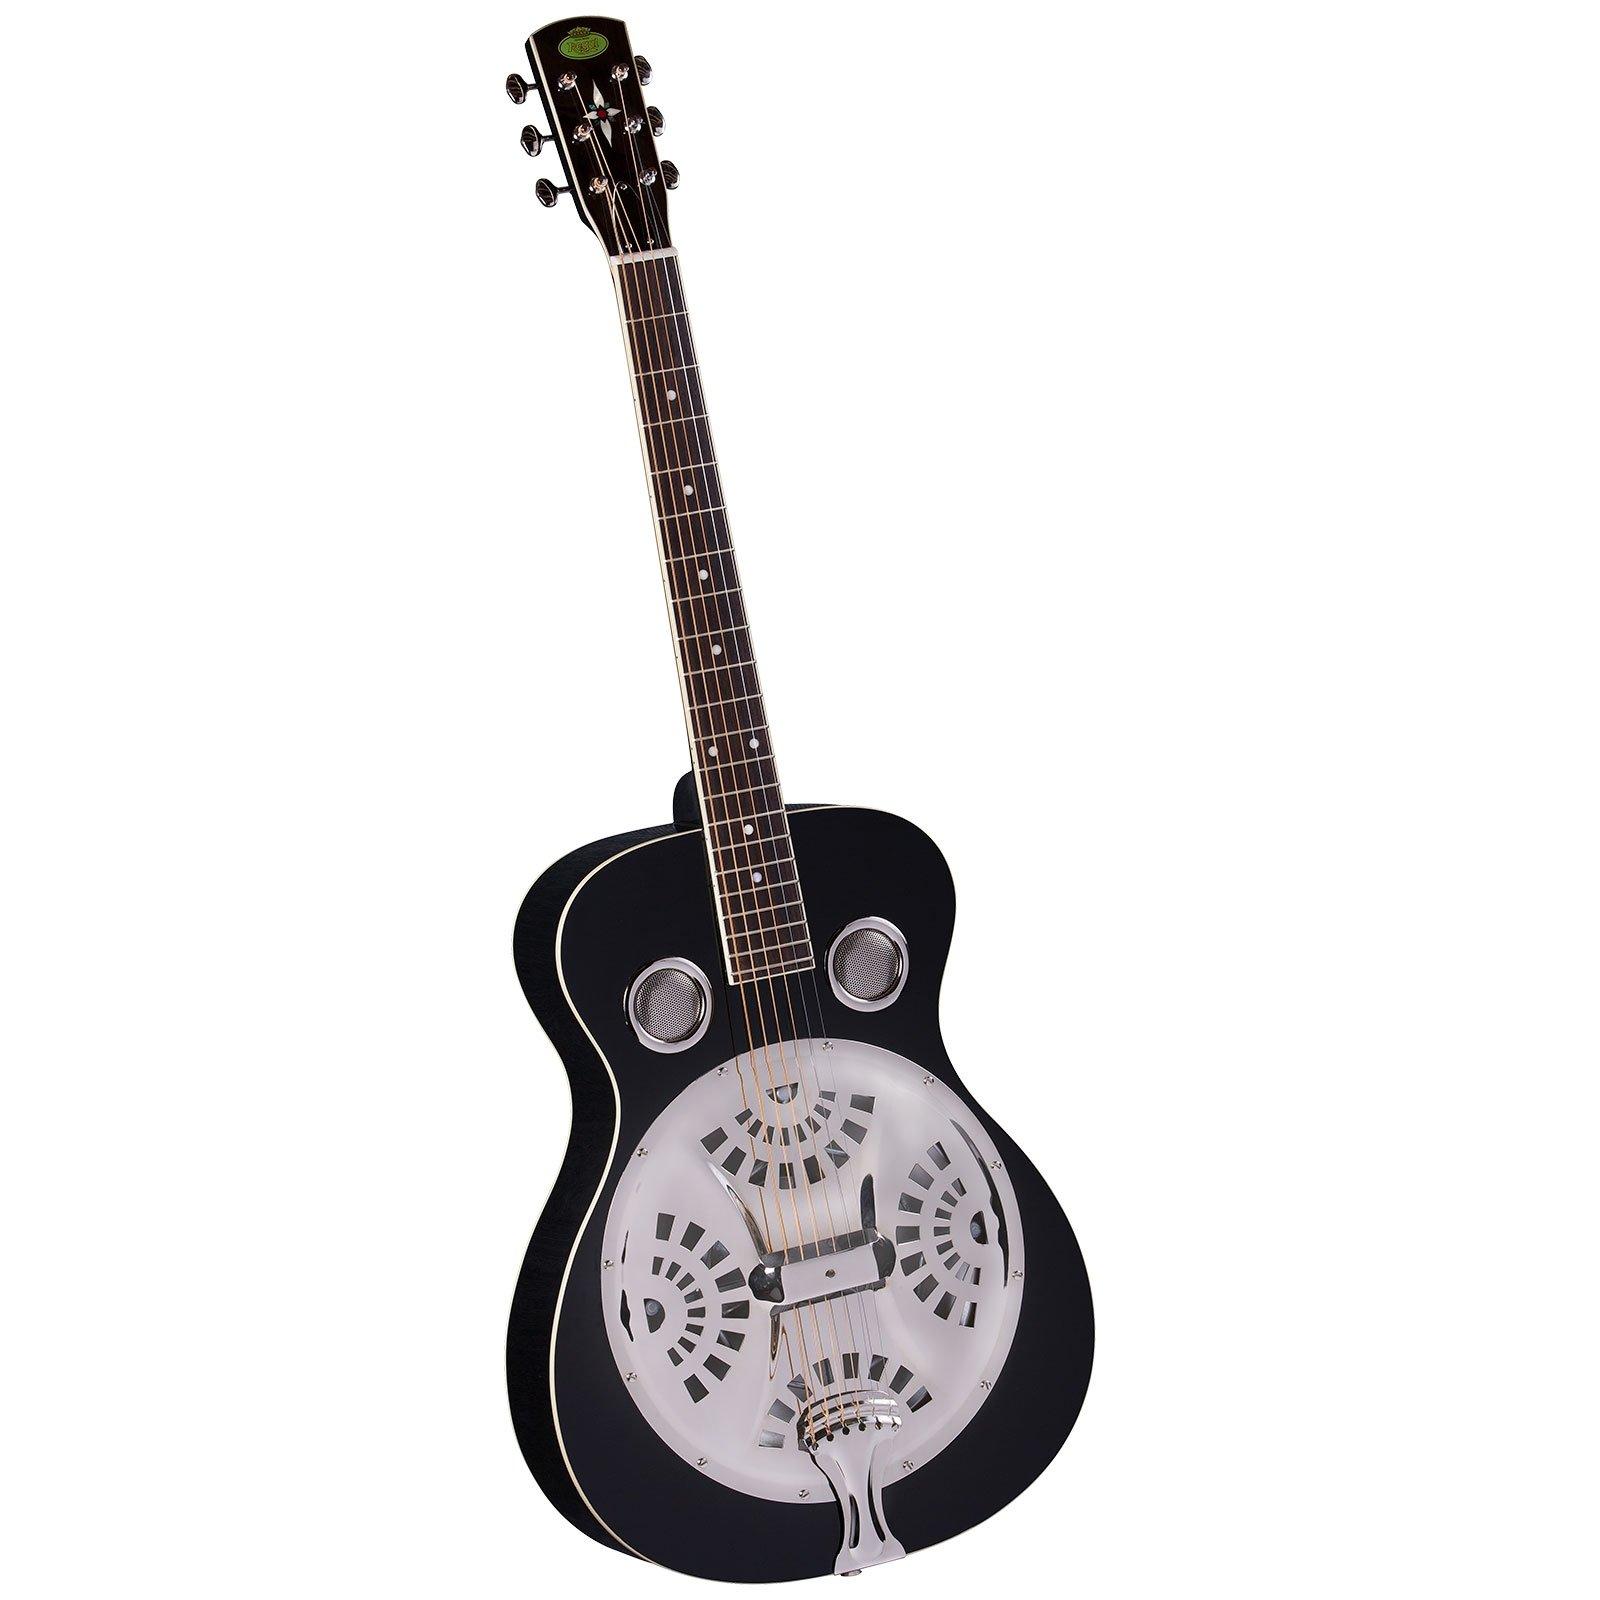 Regal RD-40B Studio Series Roundneck Resophonic Guitar - Black